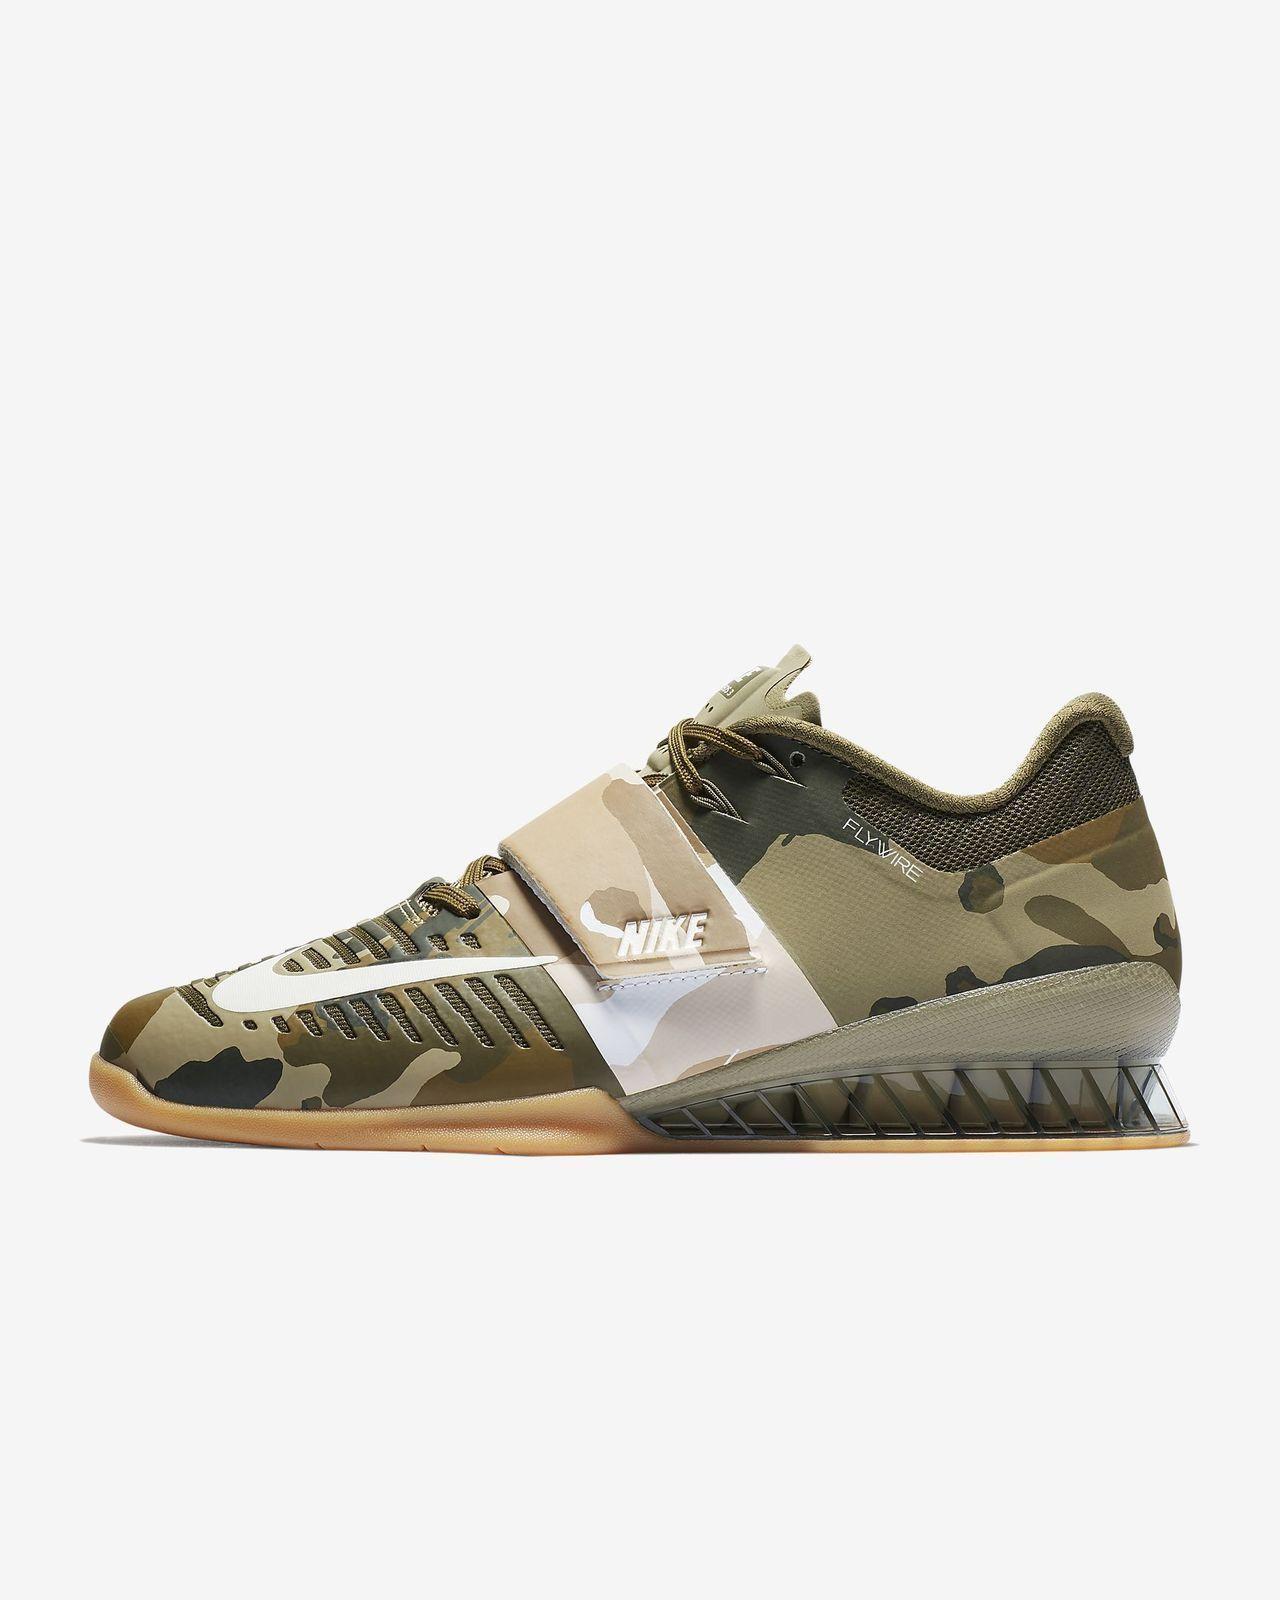 Nike Romaleos 3 Men's Weight Lifting shoes | Pythagorean Health